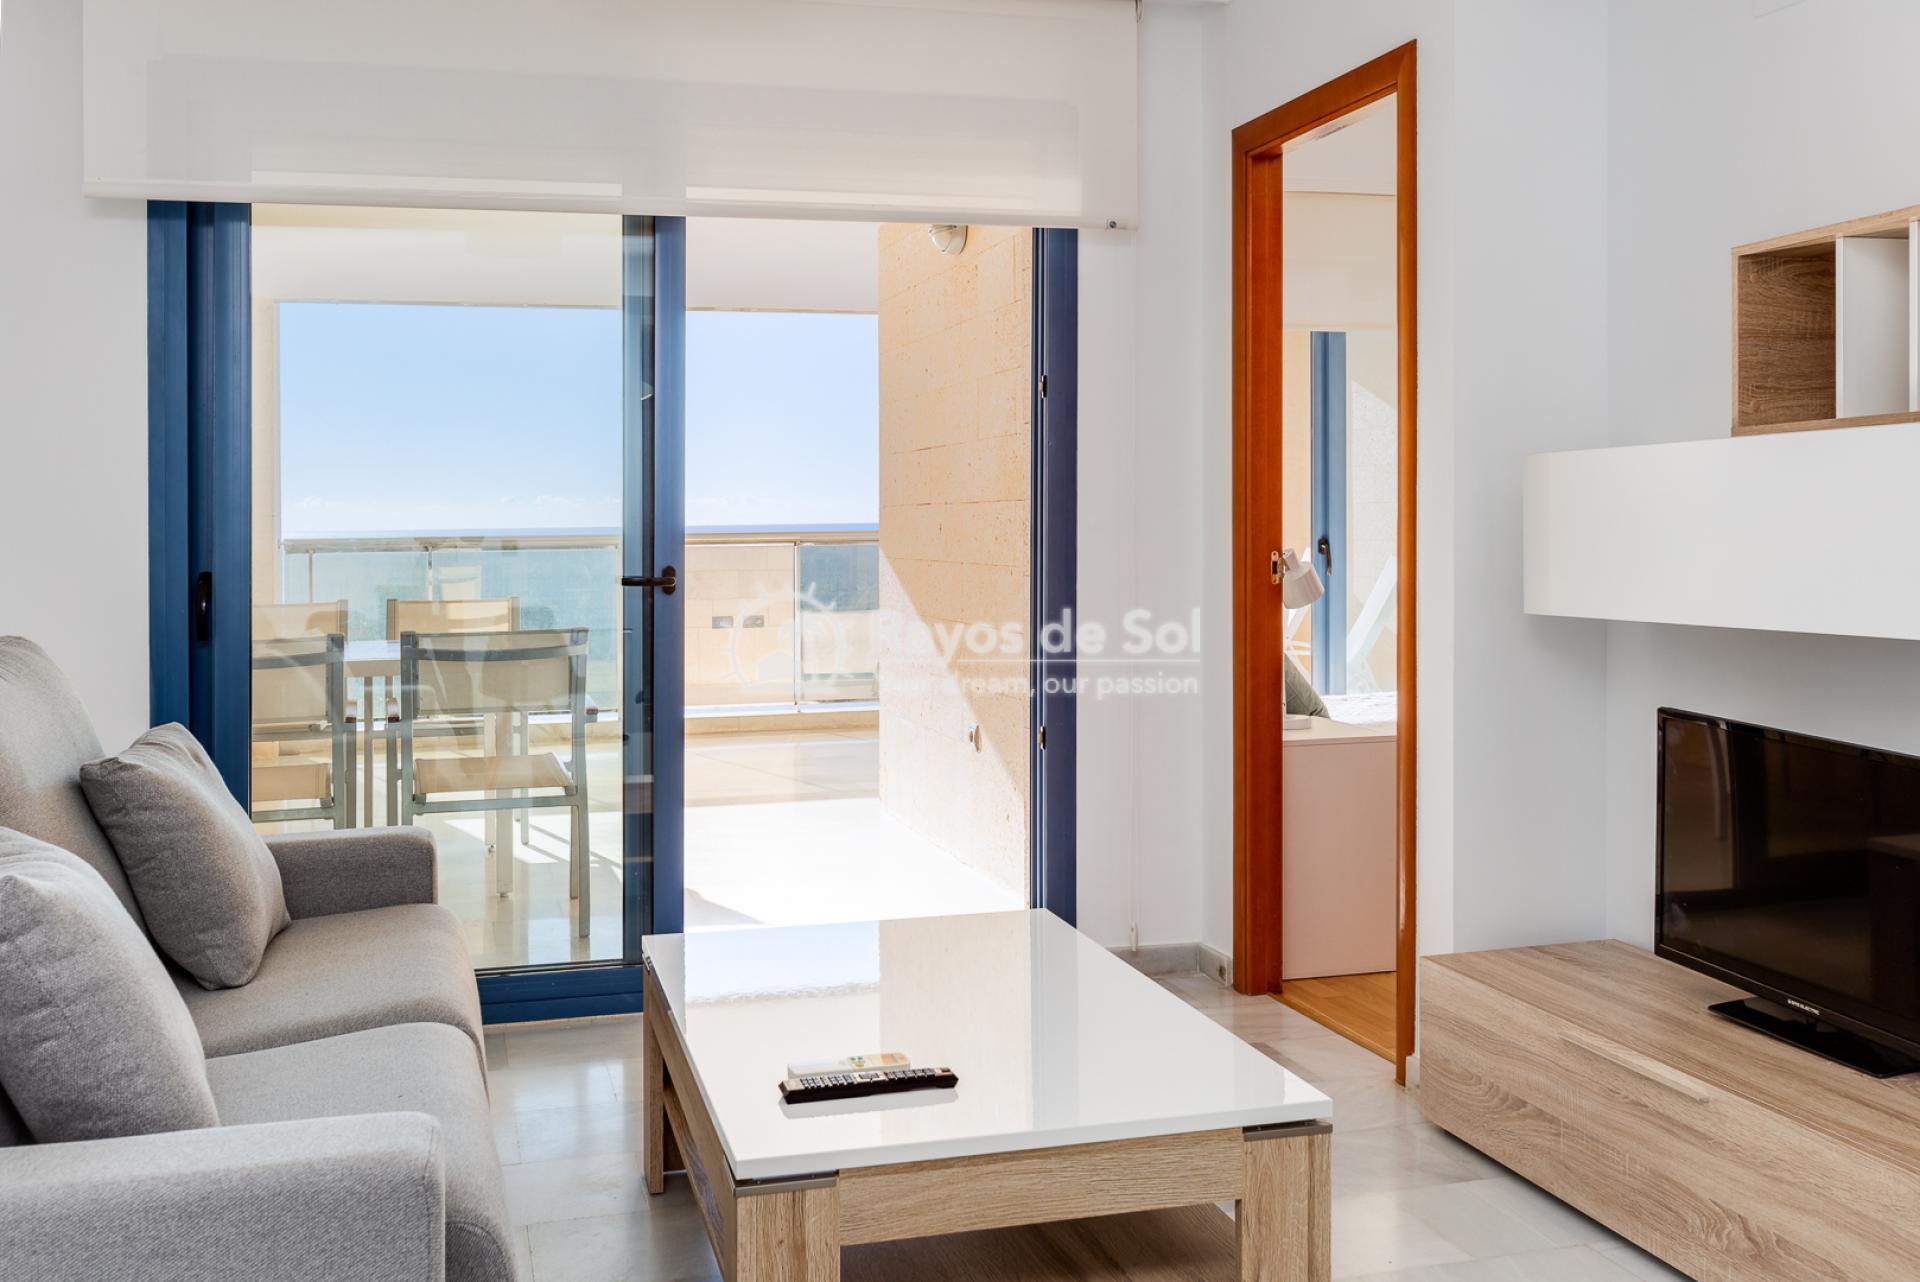 Turnekey first line apartments  in Altea, Costa Blanca (Alteabeach) - 13